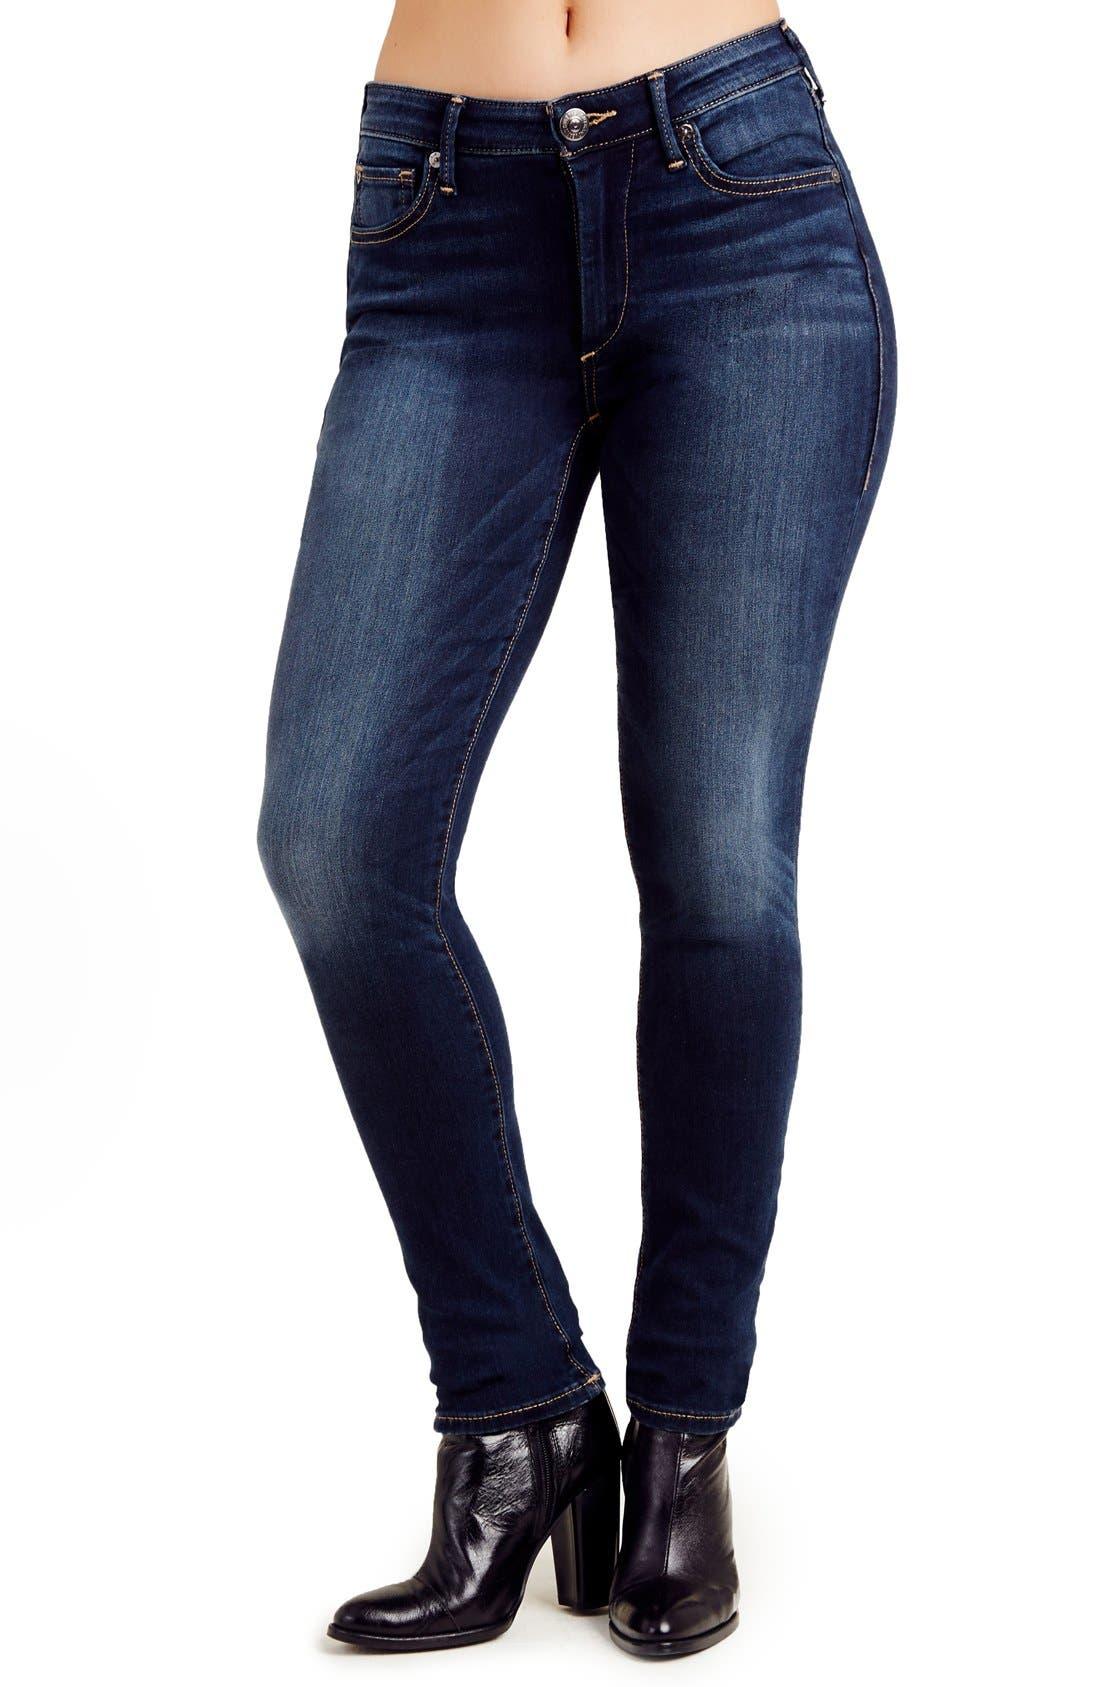 Alternate Image 1 Selected - True Religion Jeans Jennie Curvy Skinny Jeans